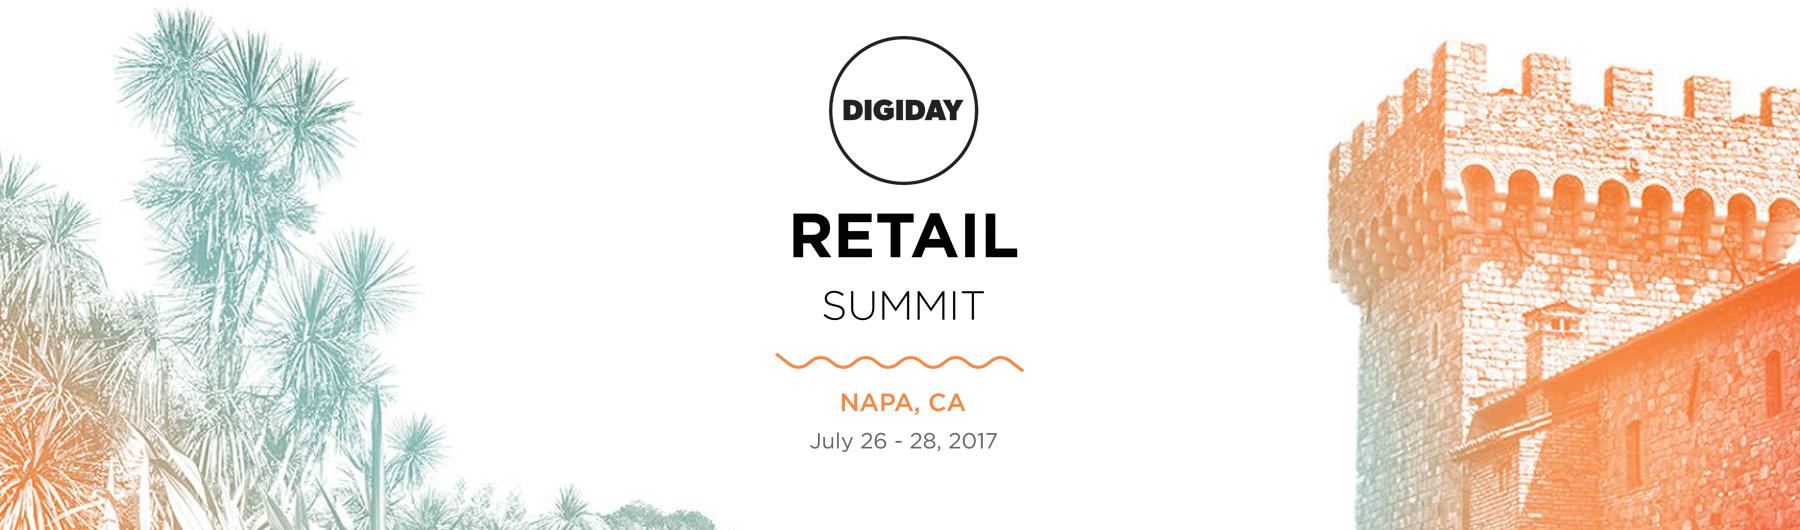 Digiday Retail Summit July 2017